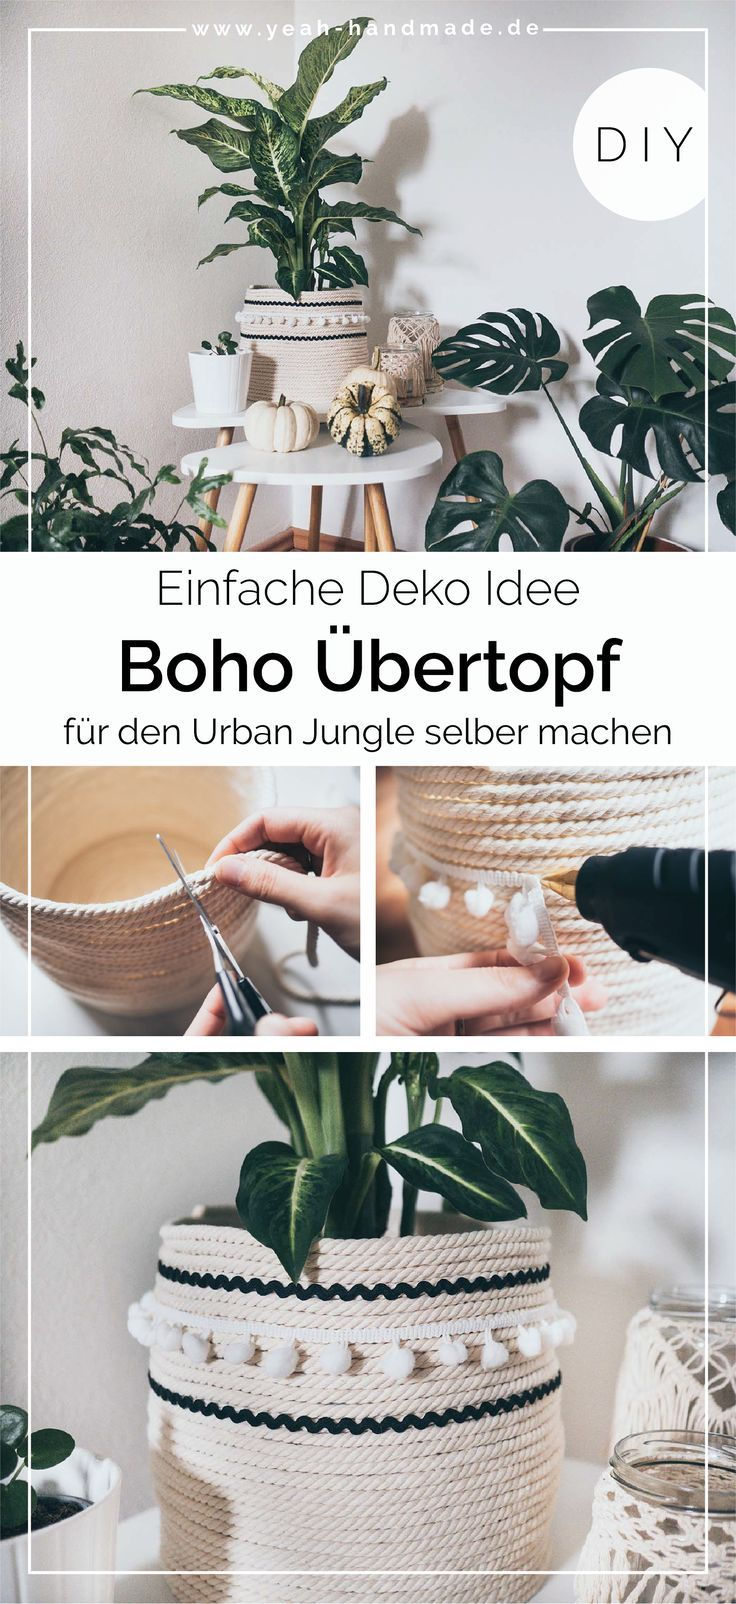 DIY Boho Übertopf selber machen - Yeah Handmade